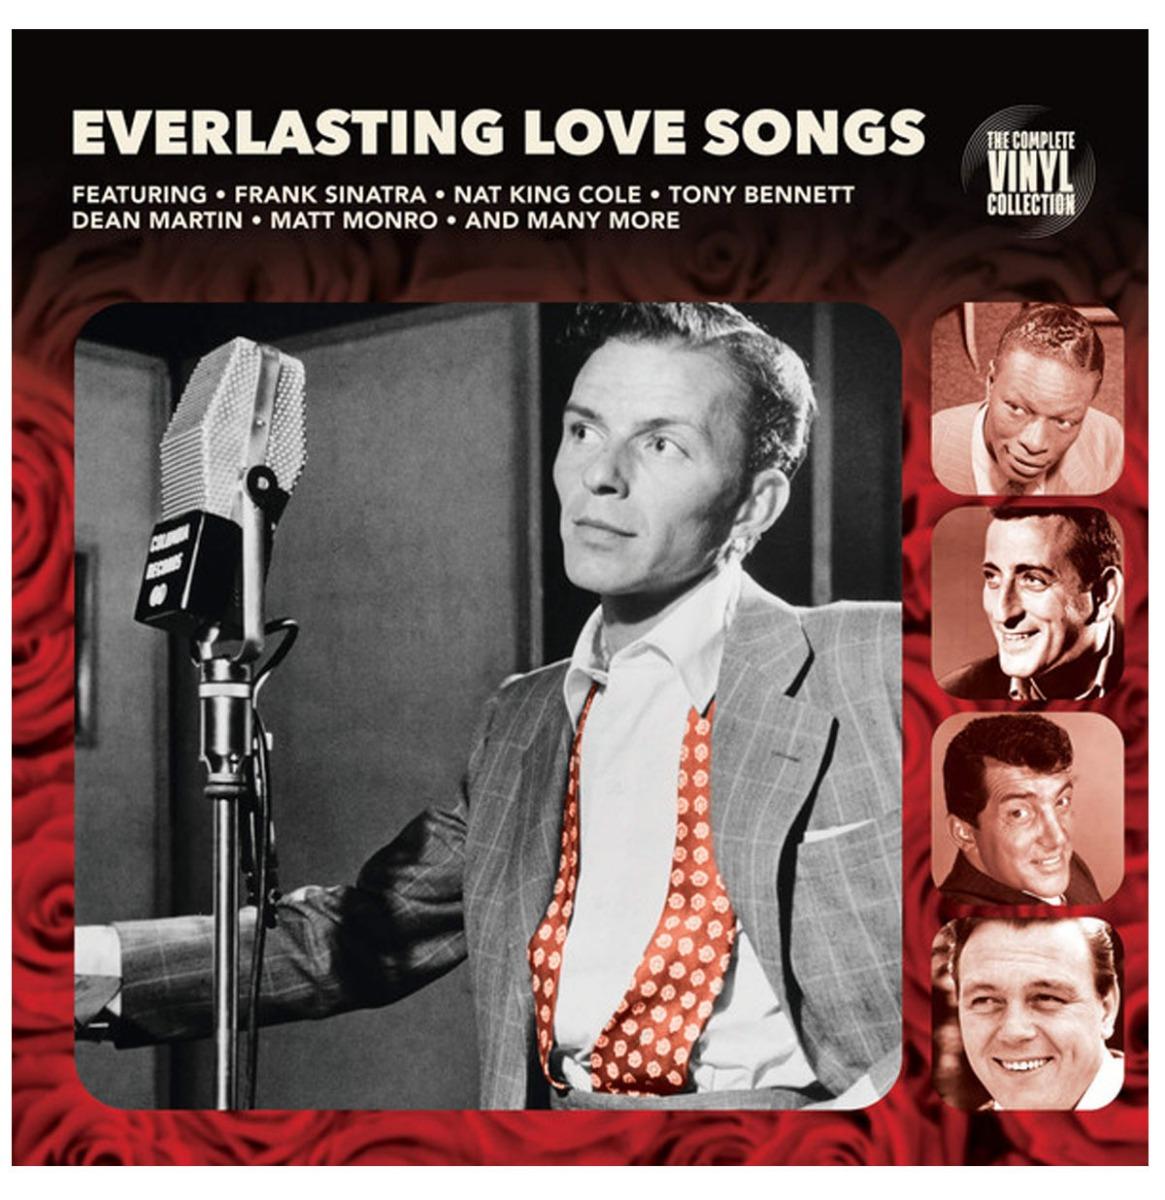 Various Artists - Everlasting Love Songs Vinyl Album LP